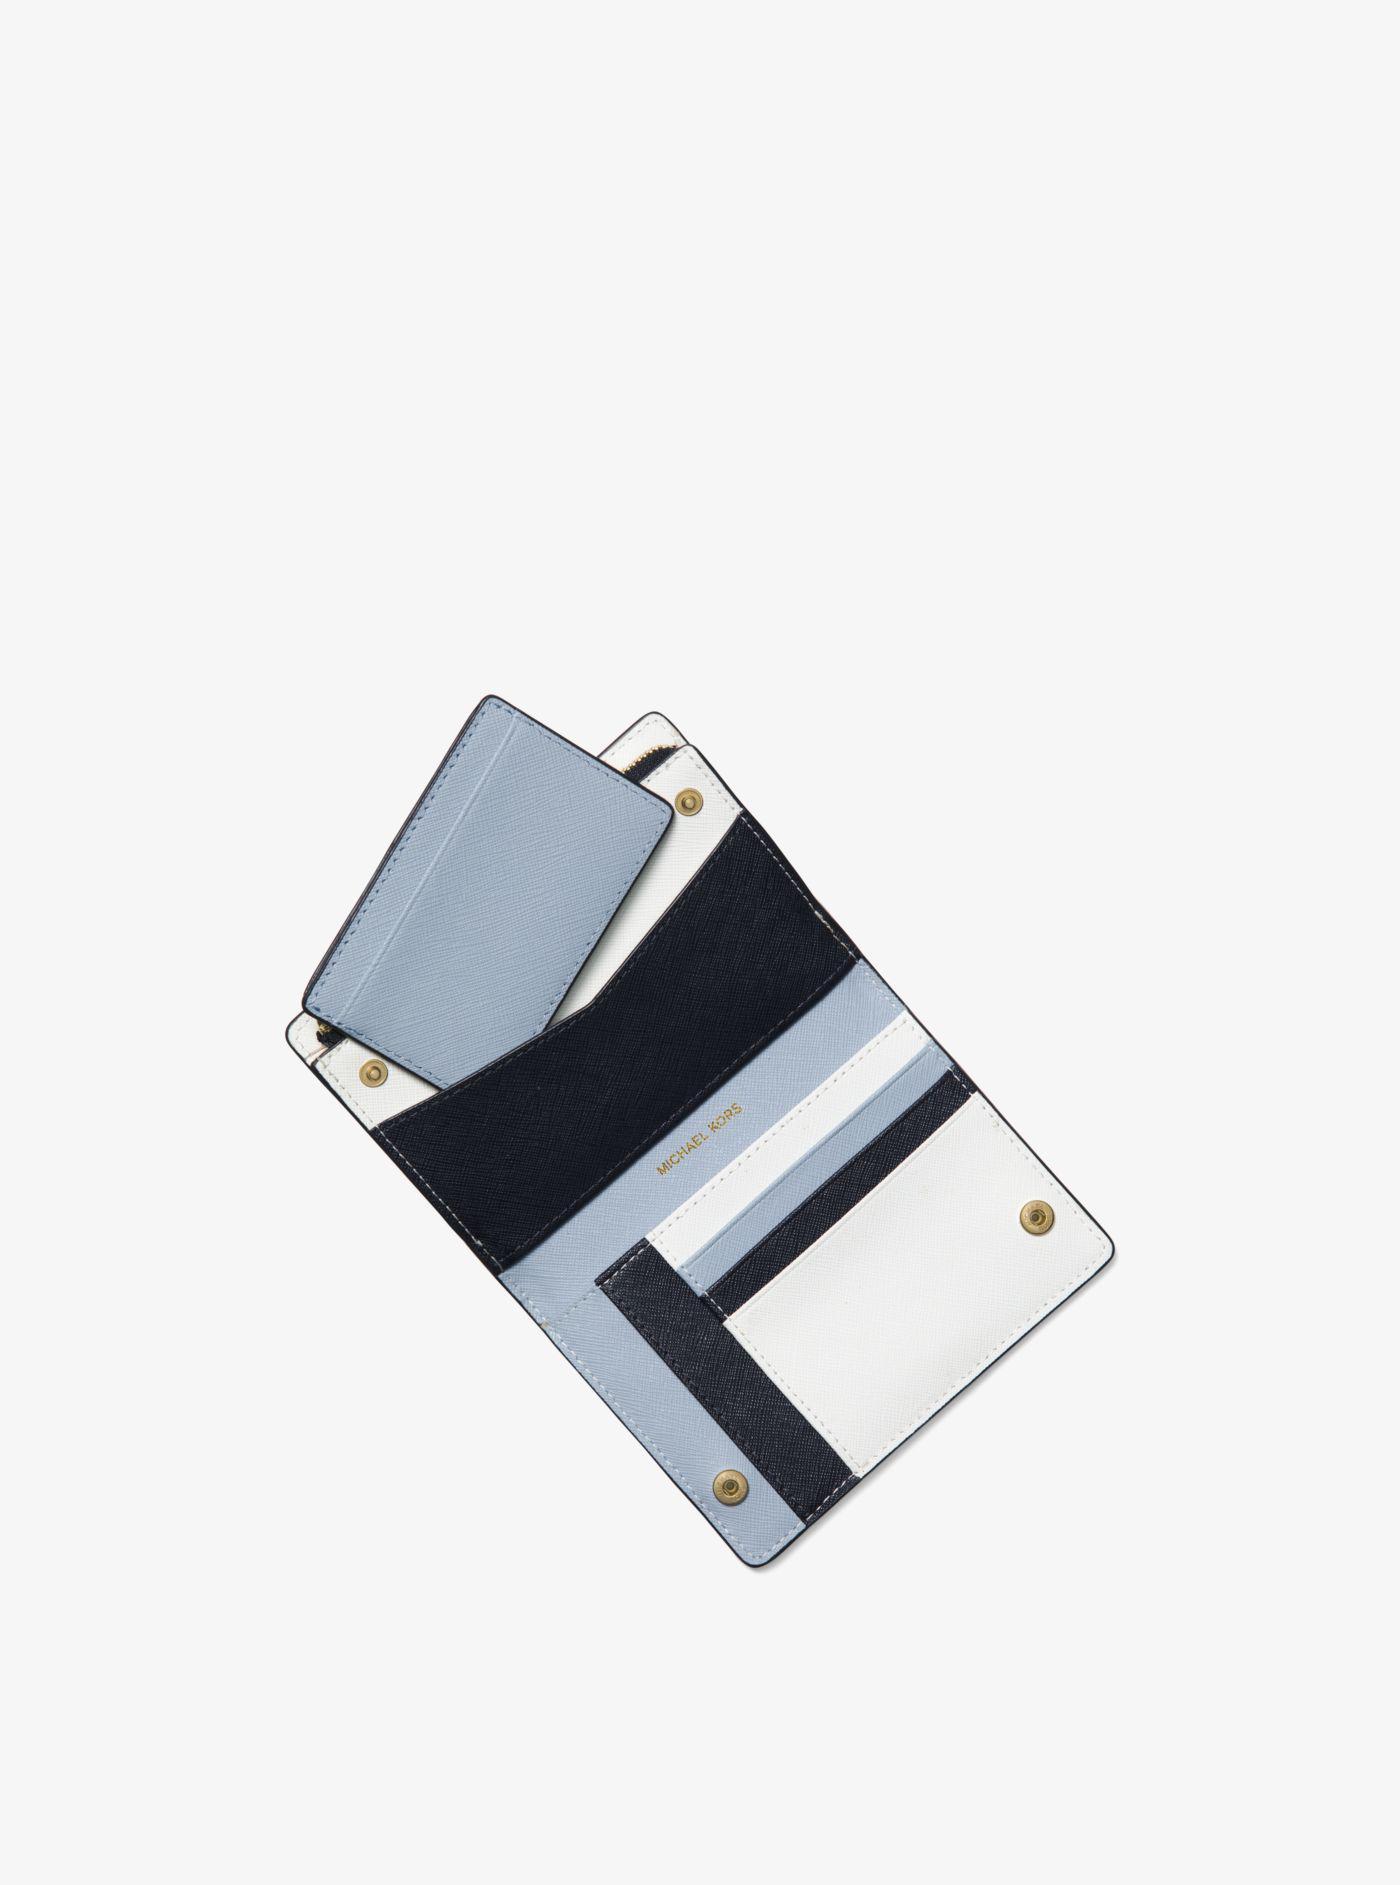 40c77806603f Lyst - Michael Kors Medium Saffiano Leather Slim Wallet in Blue